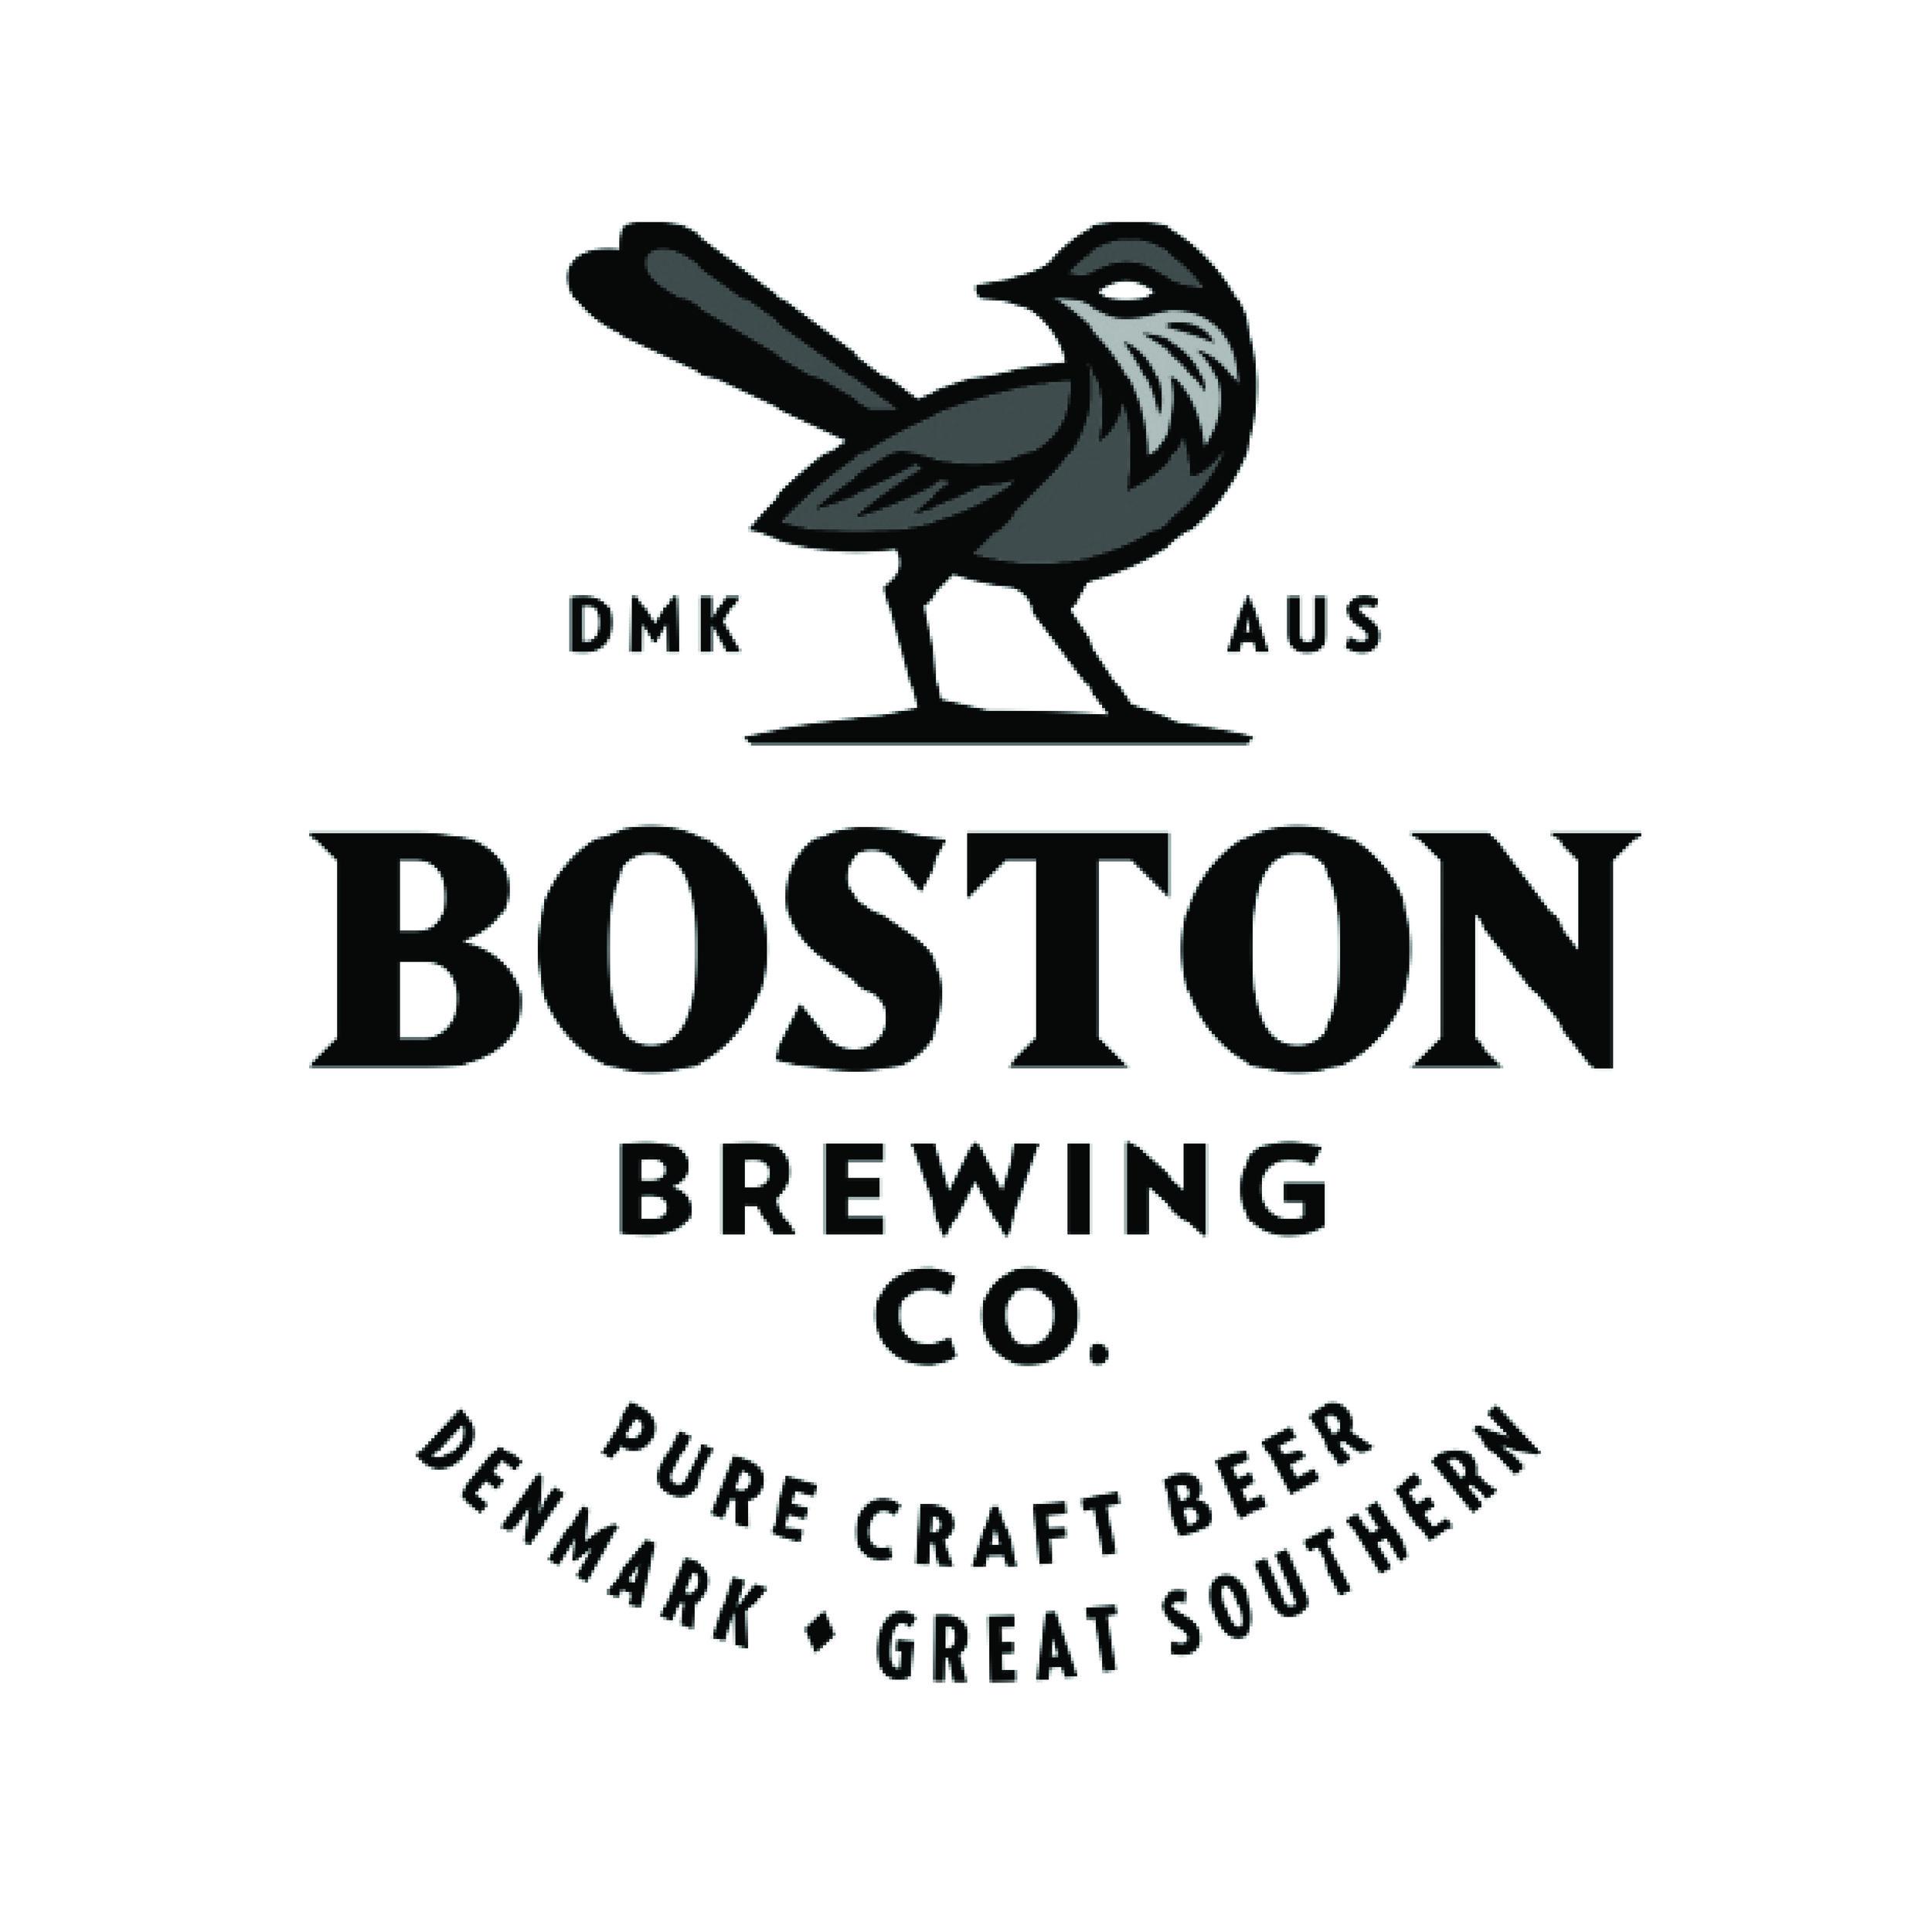 BostonBW600.jpg